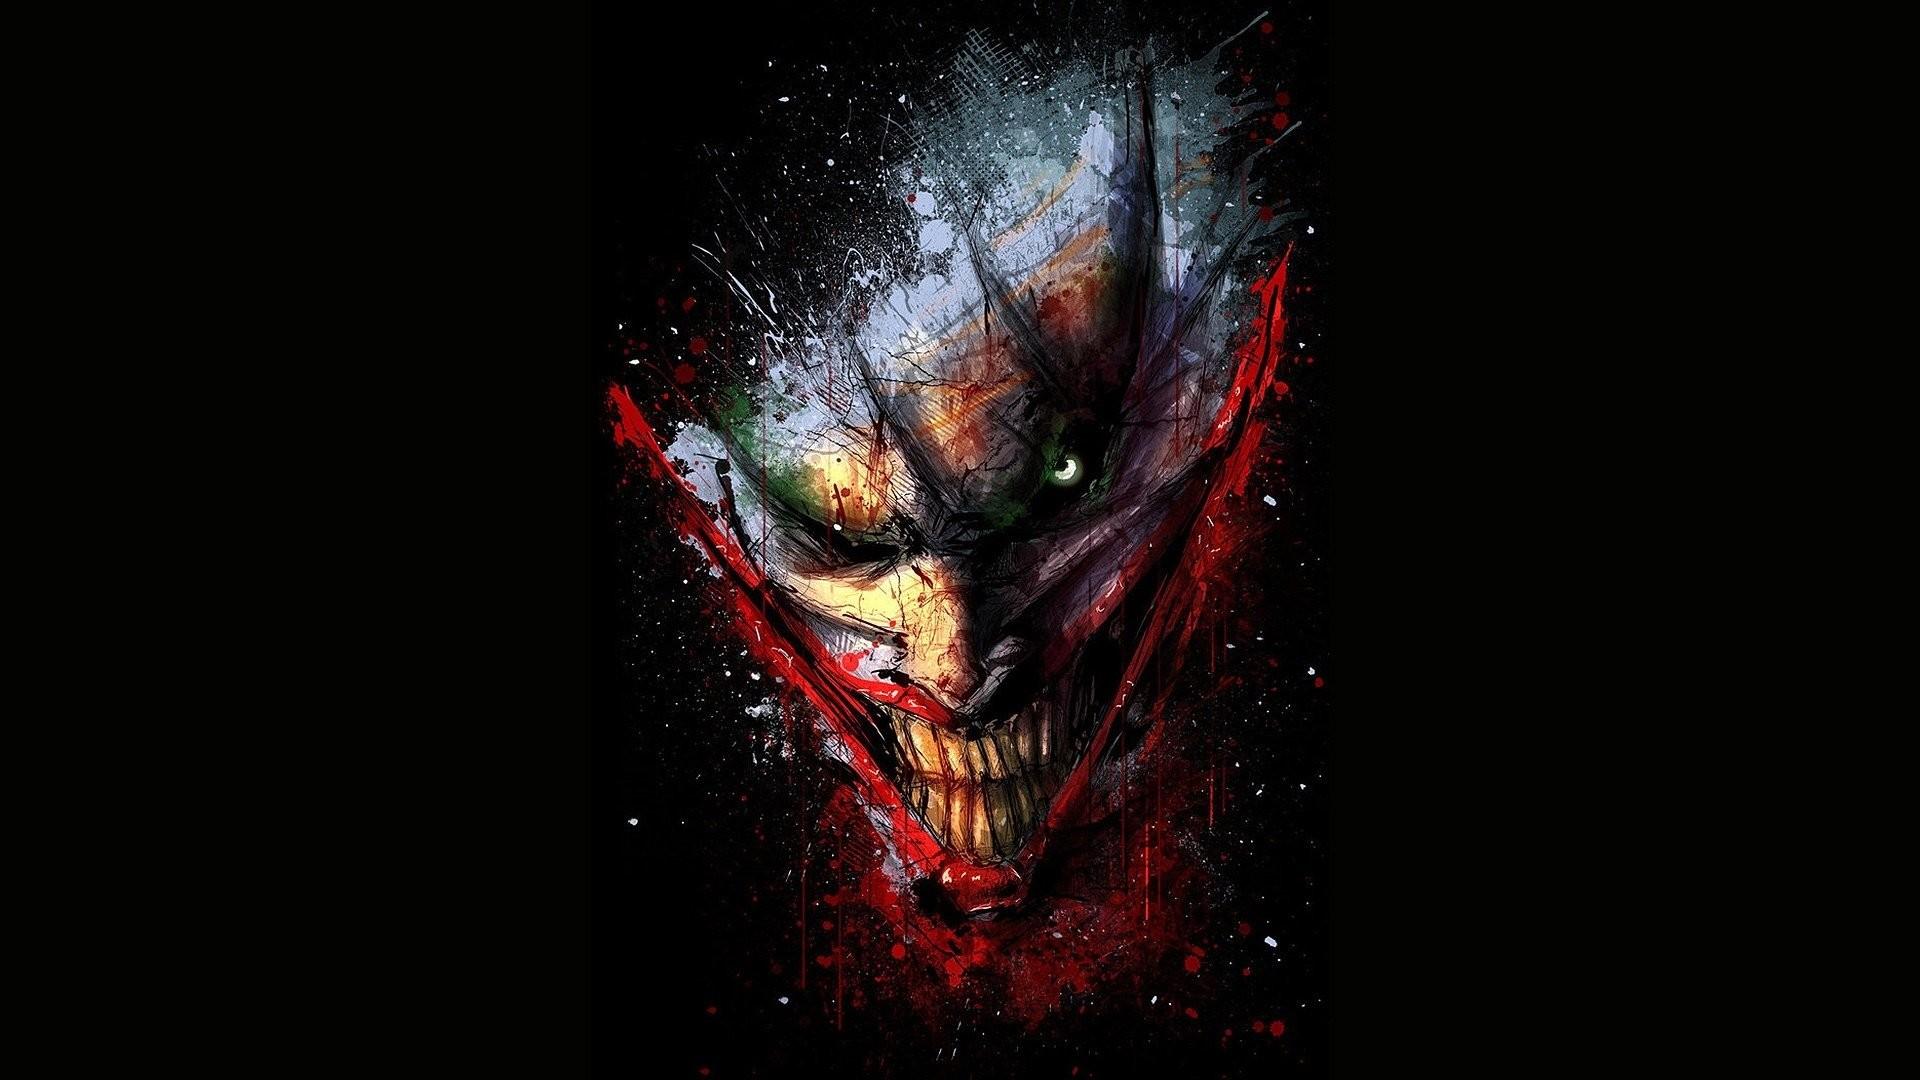 Full HD p Joker Wallpapers HD Desktop Backgrounds x